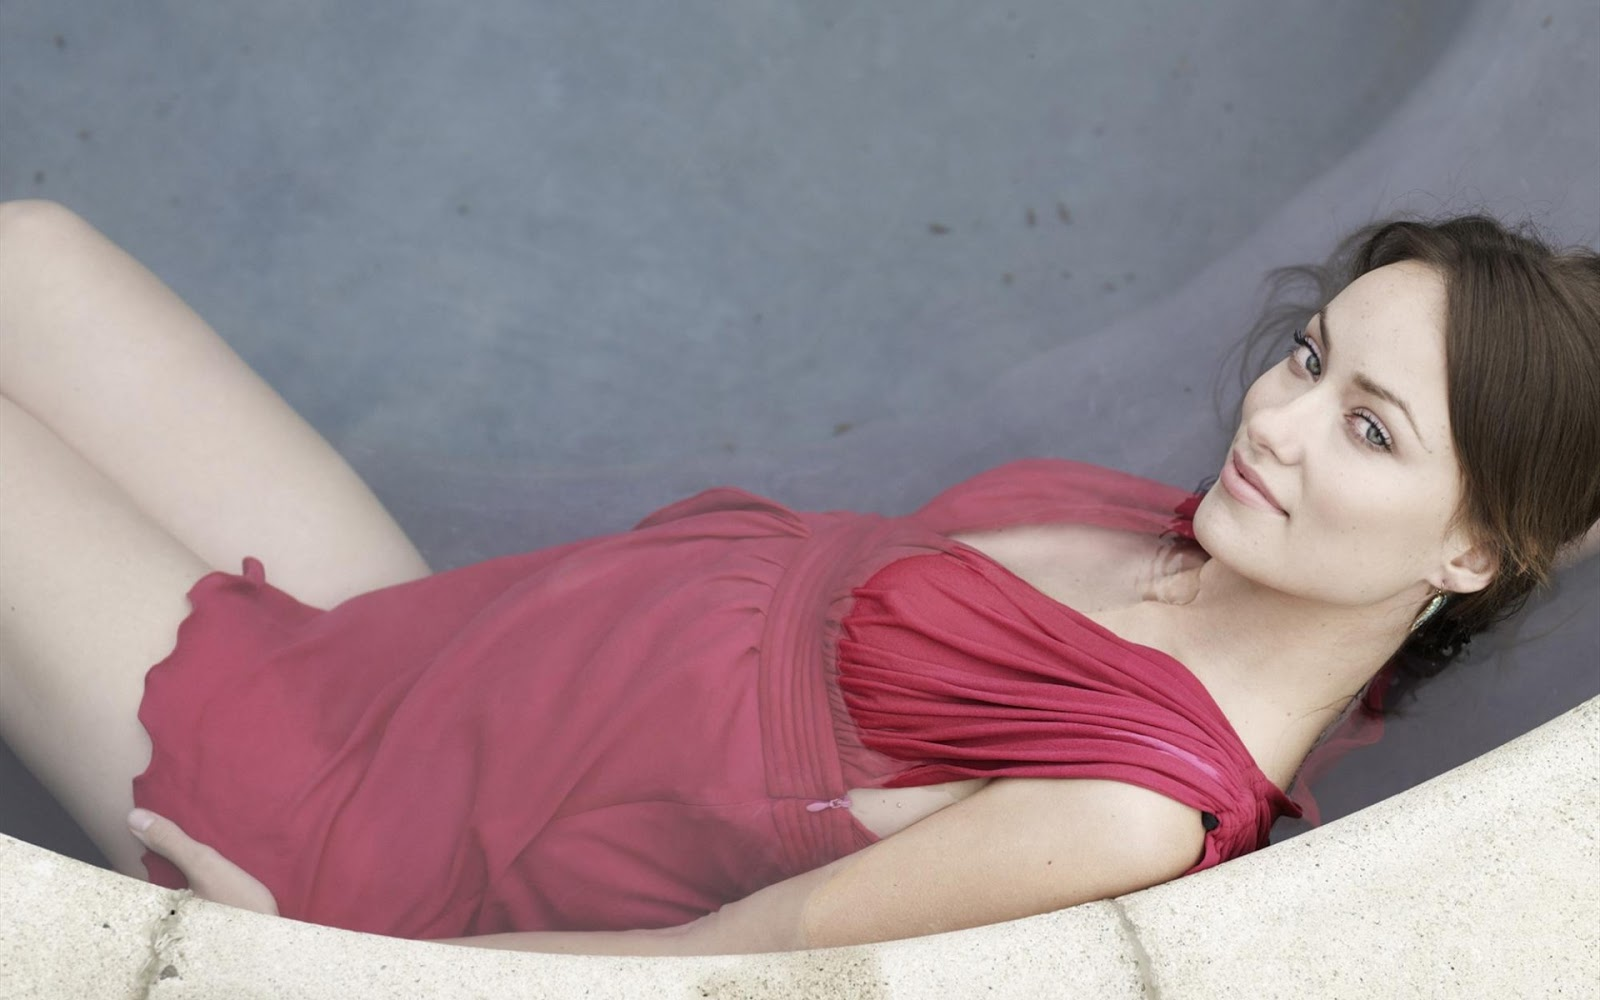 Fondos de Pantalla HD de Famosas: Olivia Wilde en la Piscina